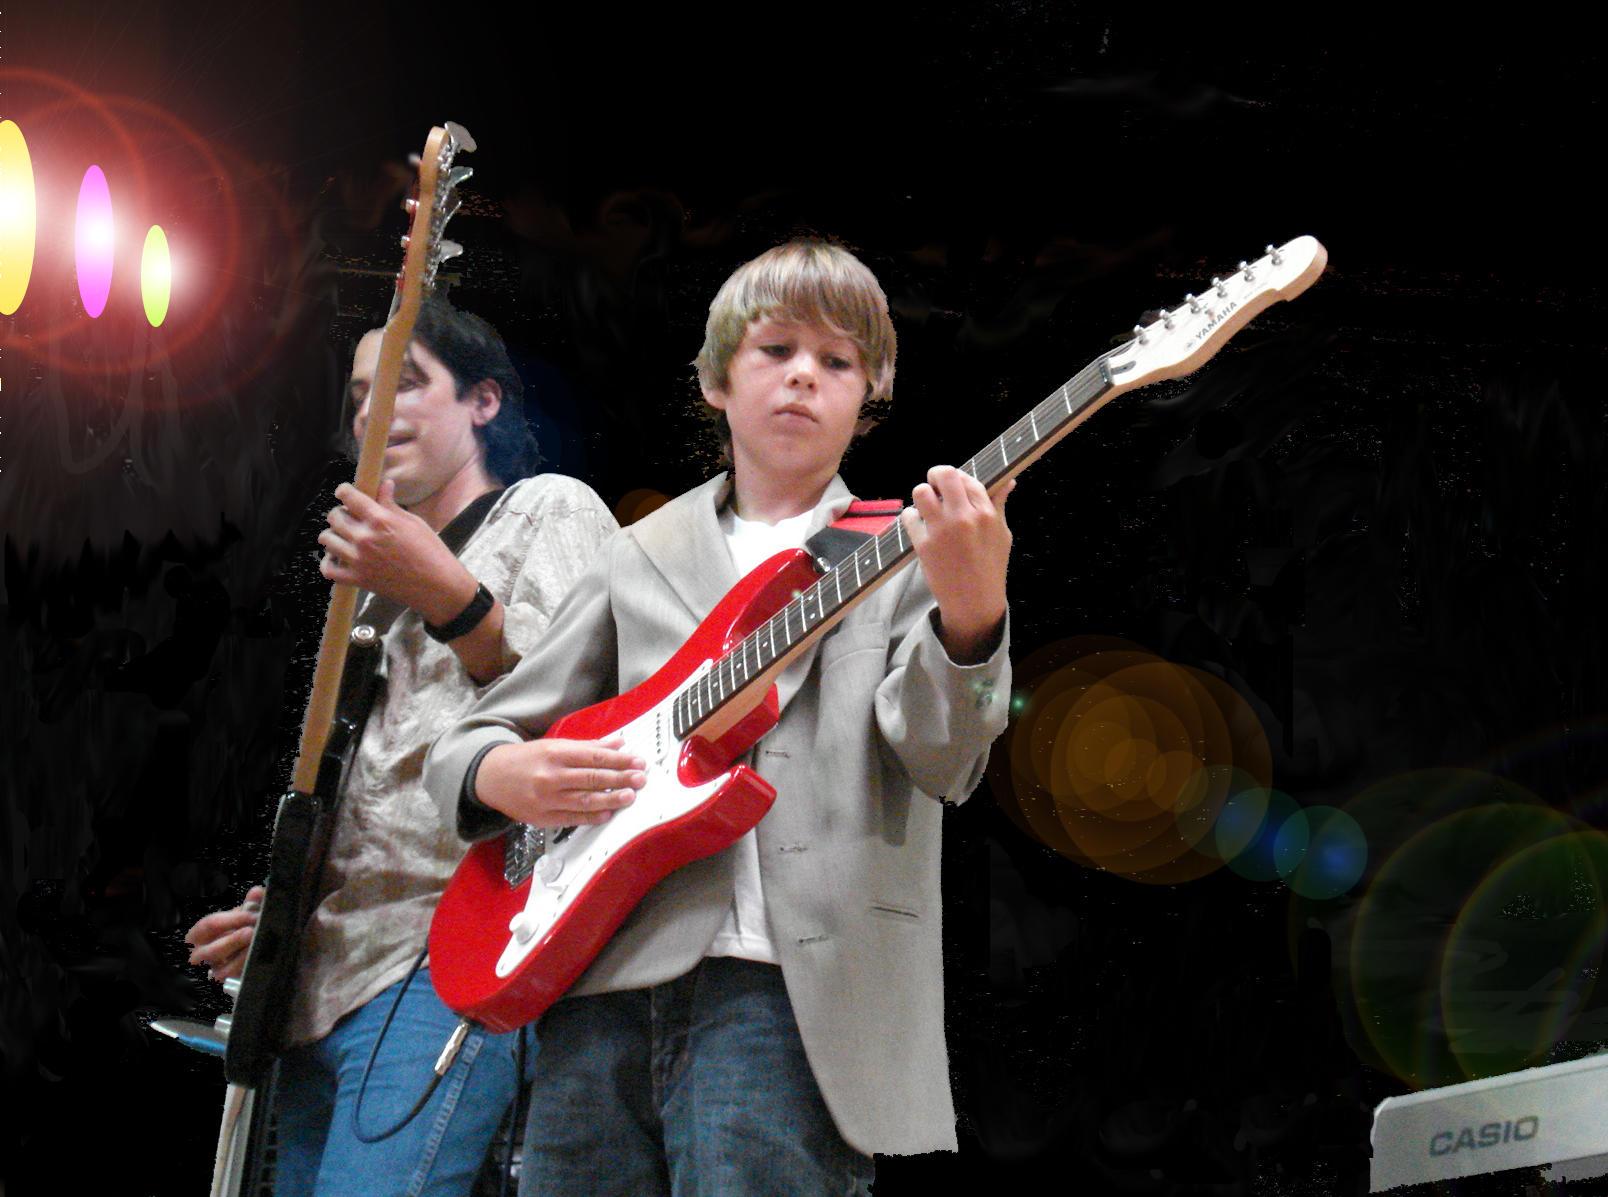 Murrieta Academy of Music & Performing Arts image 3